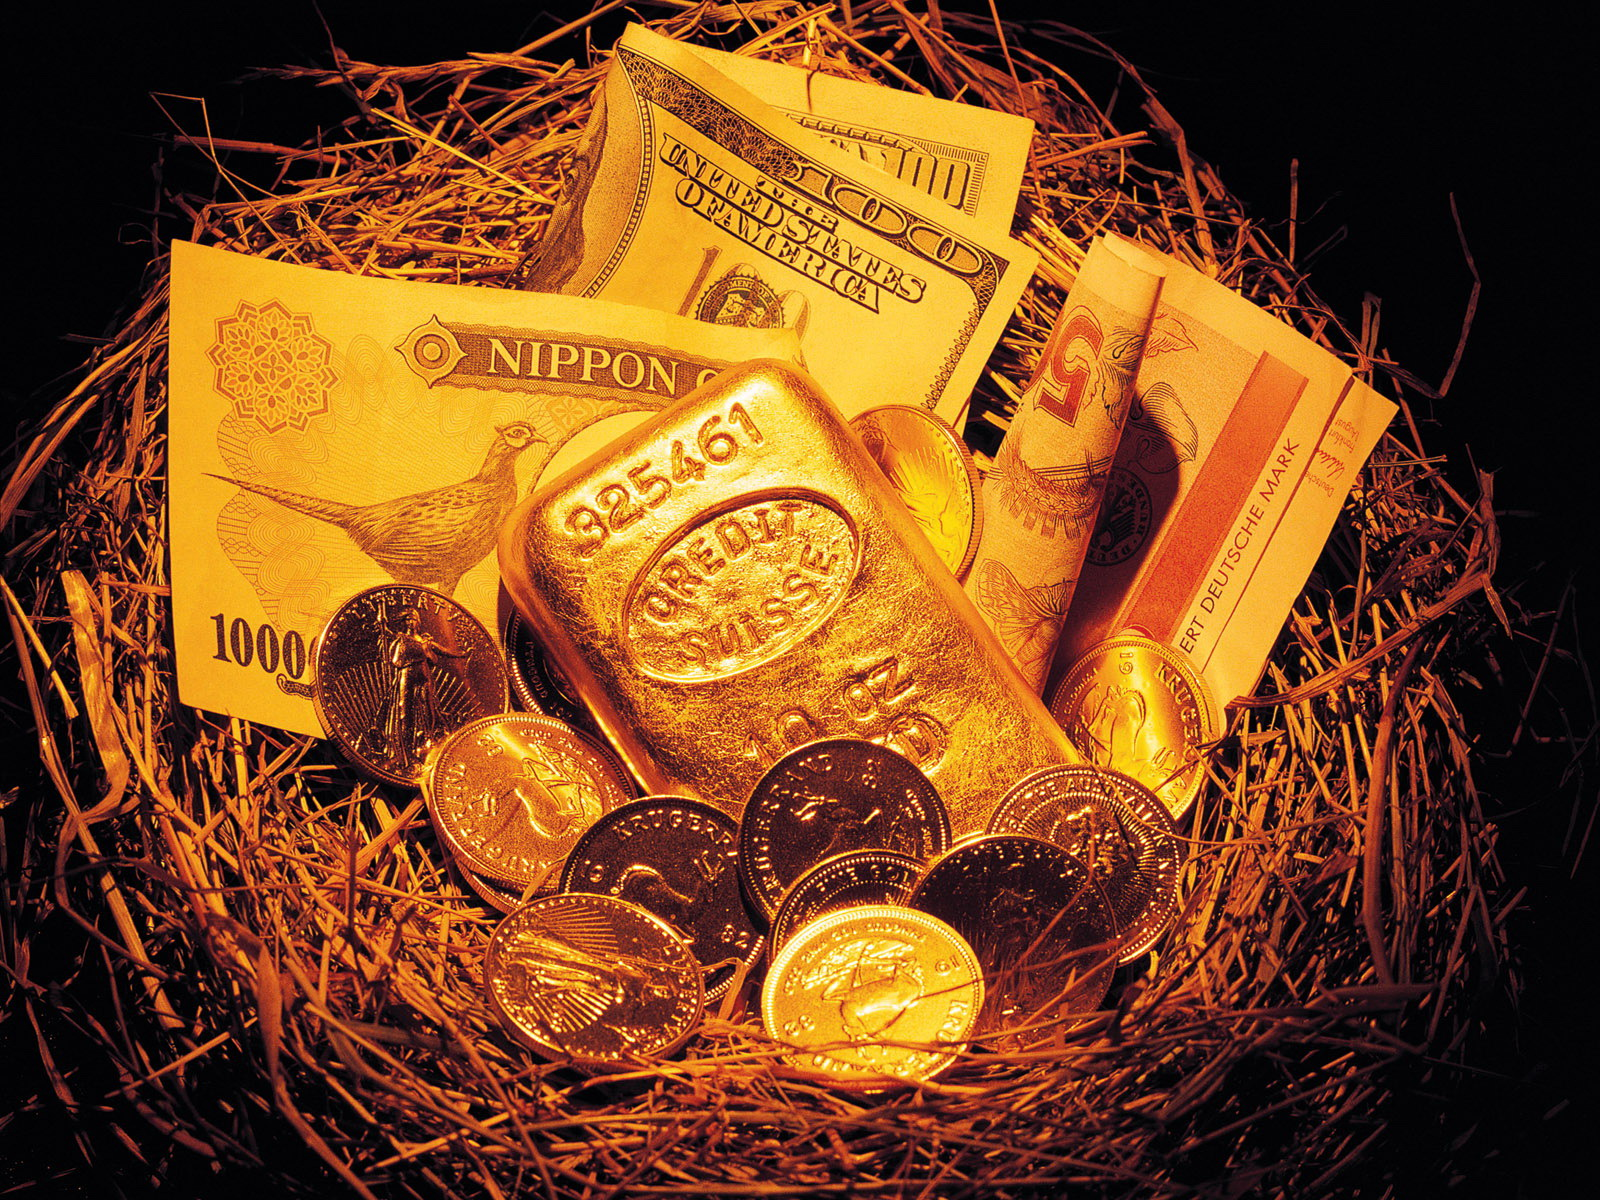 http://3.bp.blogspot.com/_PFHsbKpt1A4/TKeWSJO5mYI/AAAAAAAAAEs/TgzcJCqFp0A/s1600/gold1600_1002.jpg